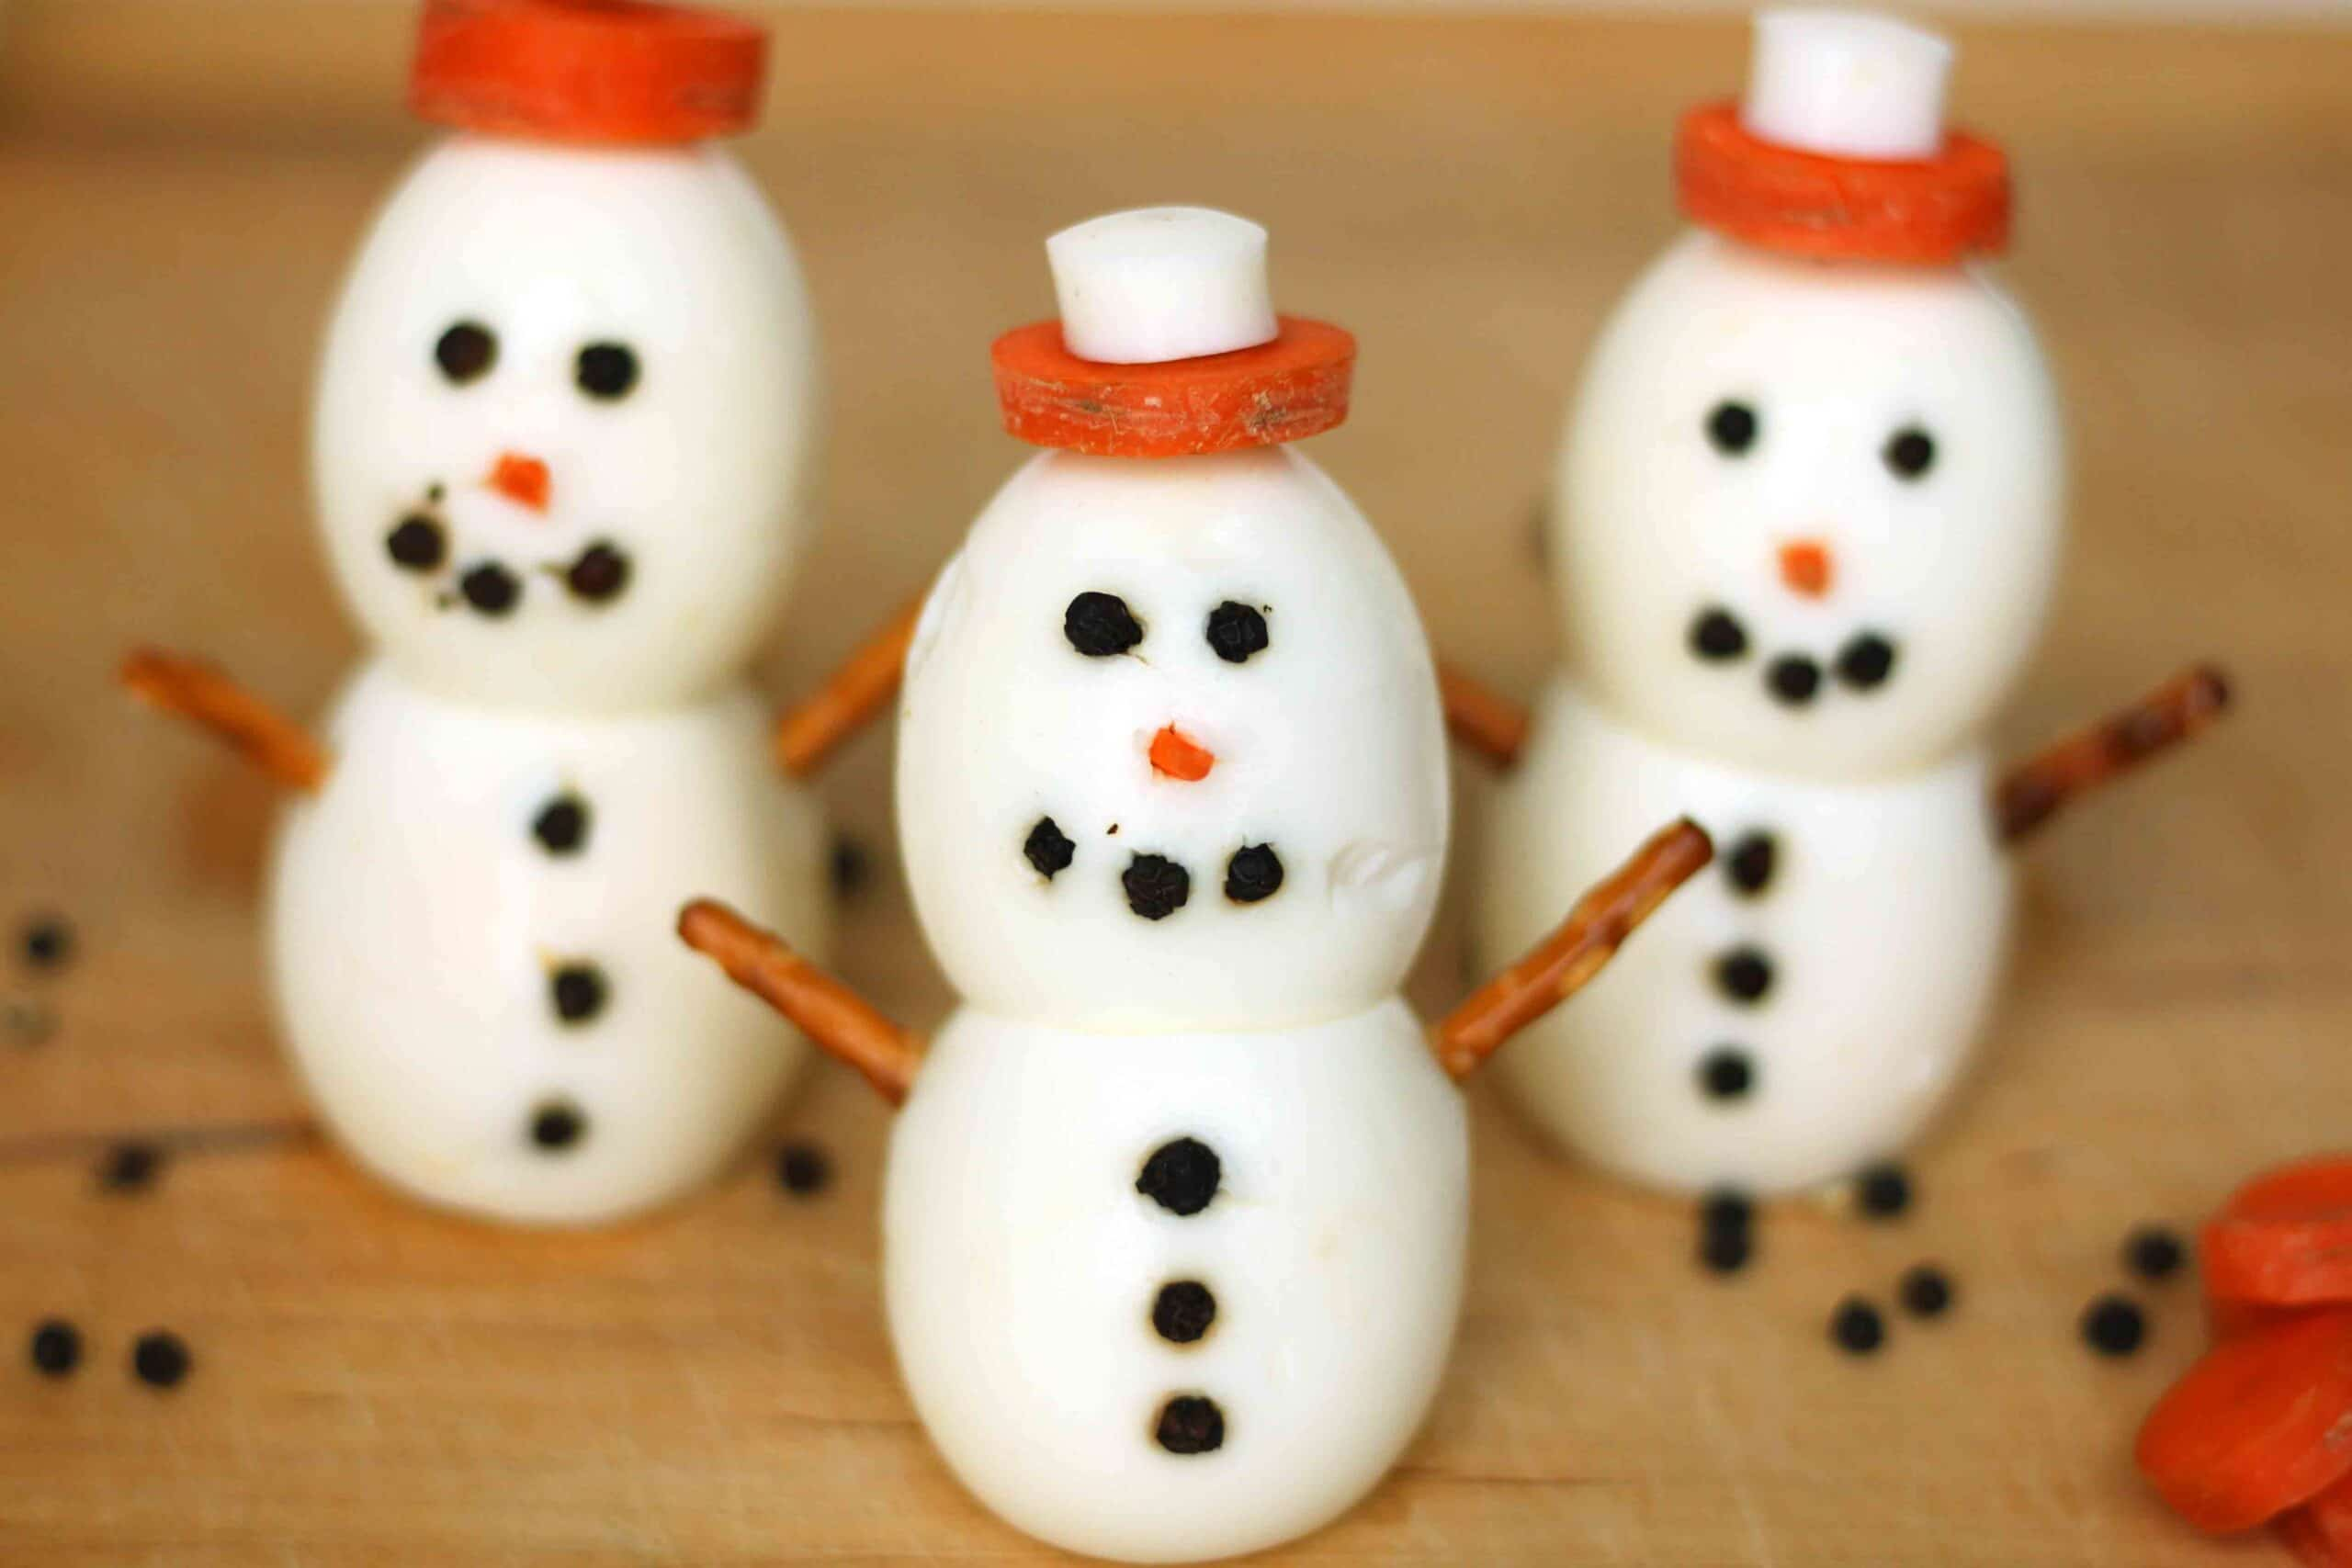 Egg Snowmen Pinterest Worthy Holiday Eats on Breakfast Television with @jesselwellness